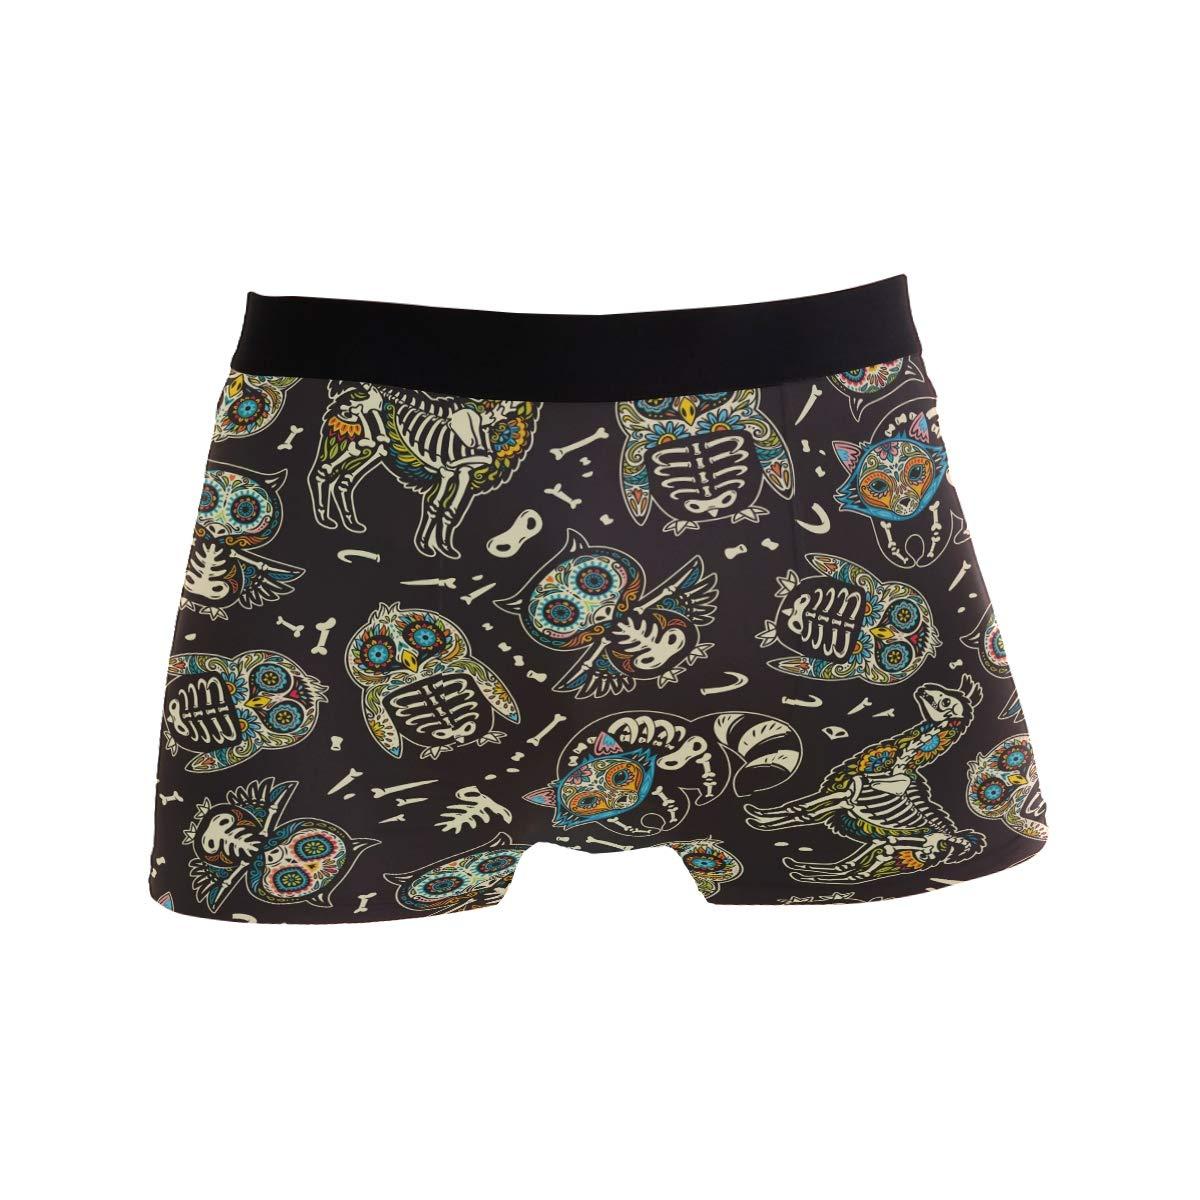 ZZKKO Skull Owl Mens Boxer Briefs Underwear Breathable Stretch Boxer Trunk with Pouch S-XL